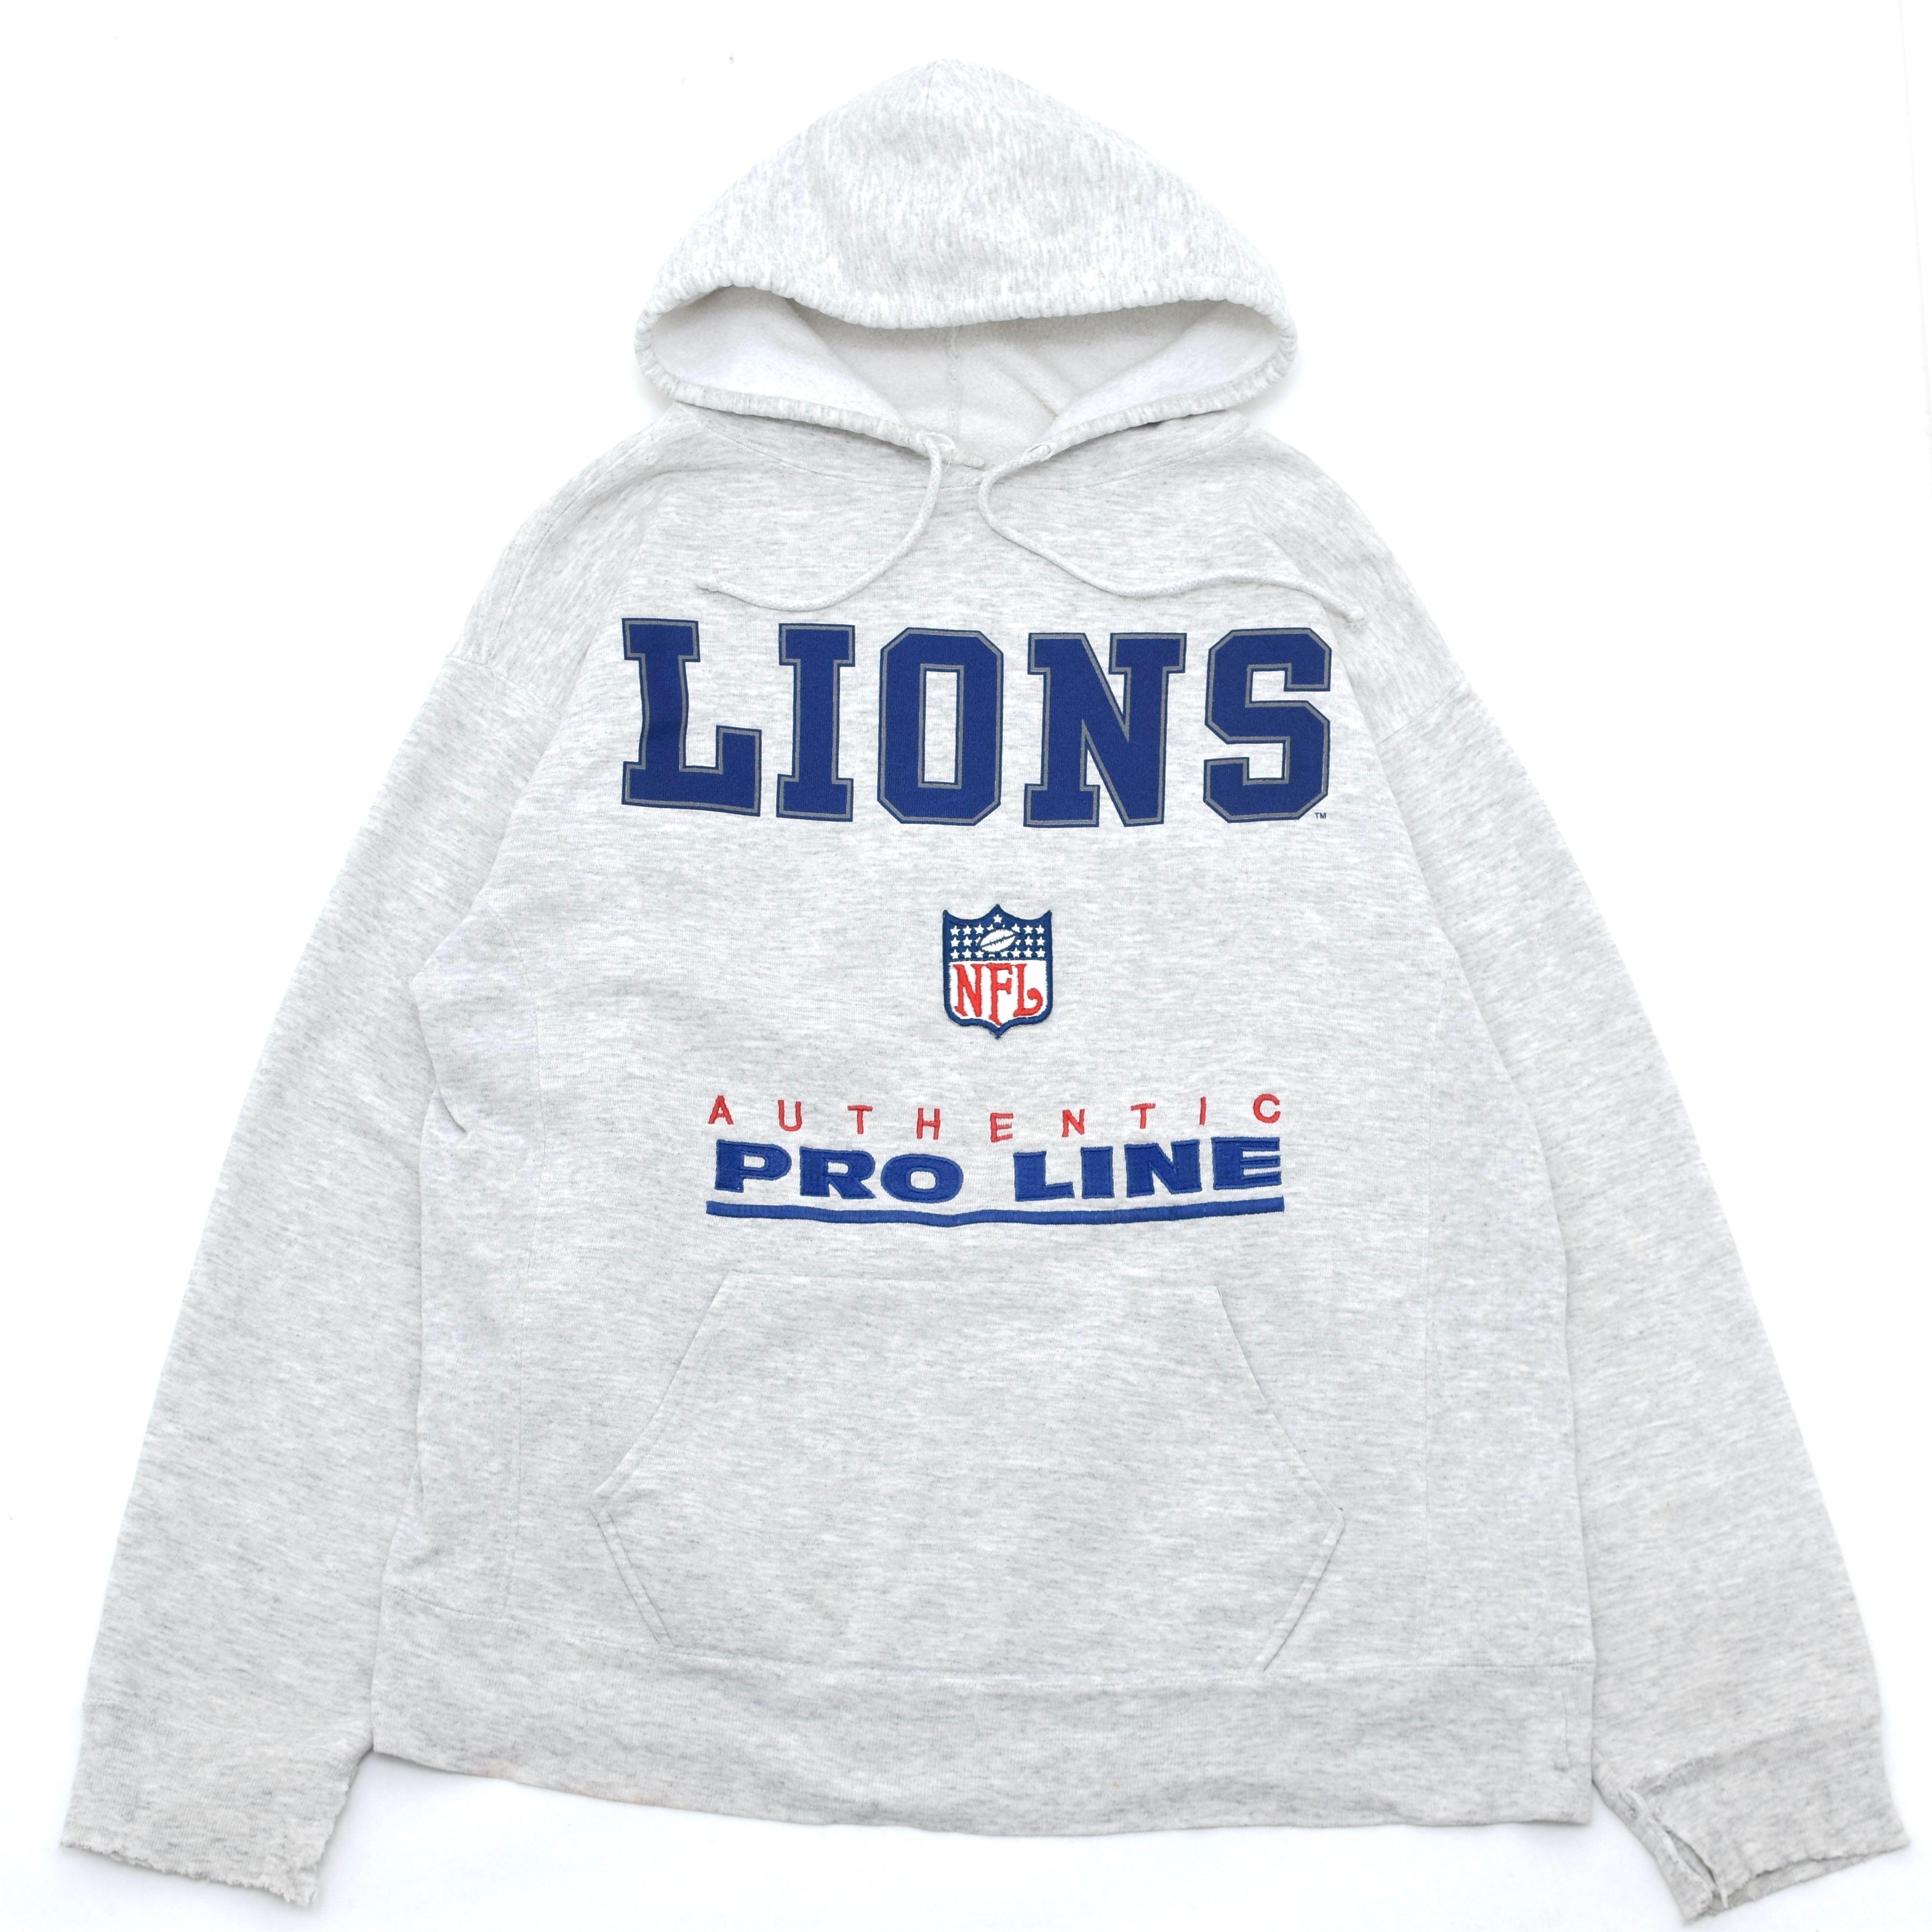 NFL logo sweatparka Made in USA